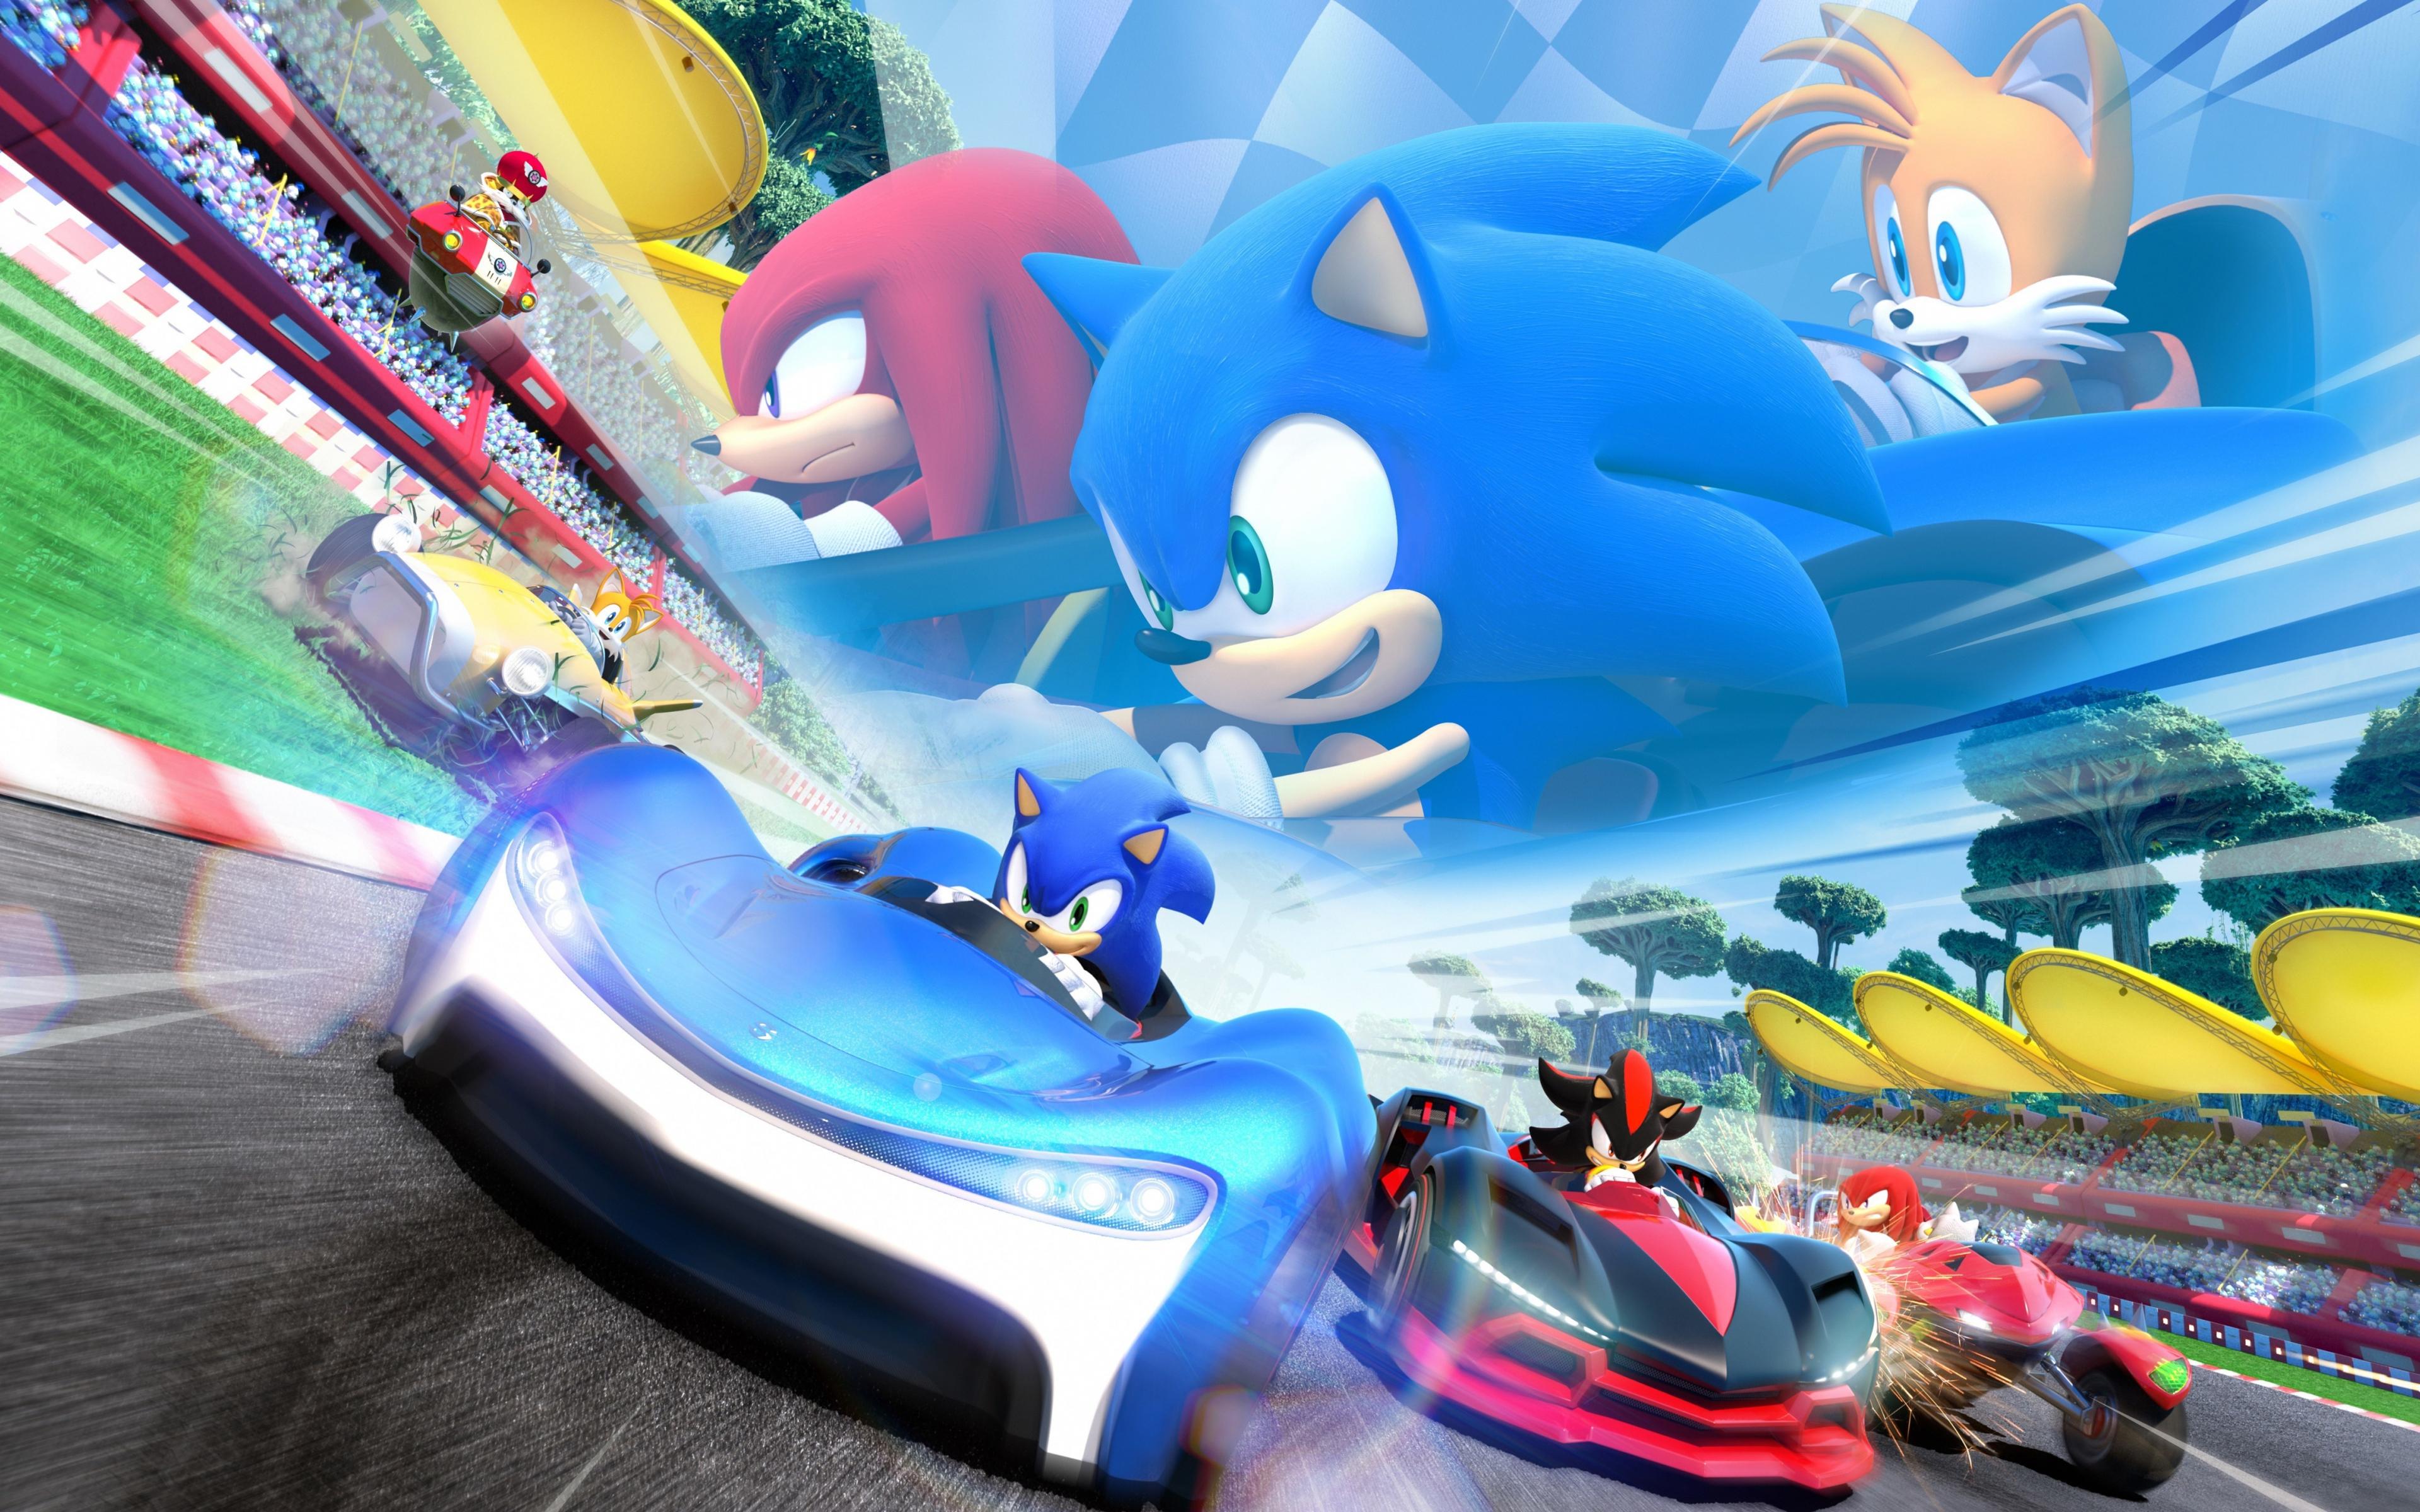 Download 3840x2400 Wallpaper Sonic The Hedgehog Video Game Kart Racing Game Nintendo 4k Ultra Hd 16 10 Widescreen 3840x2400 Hd Image Background 8471